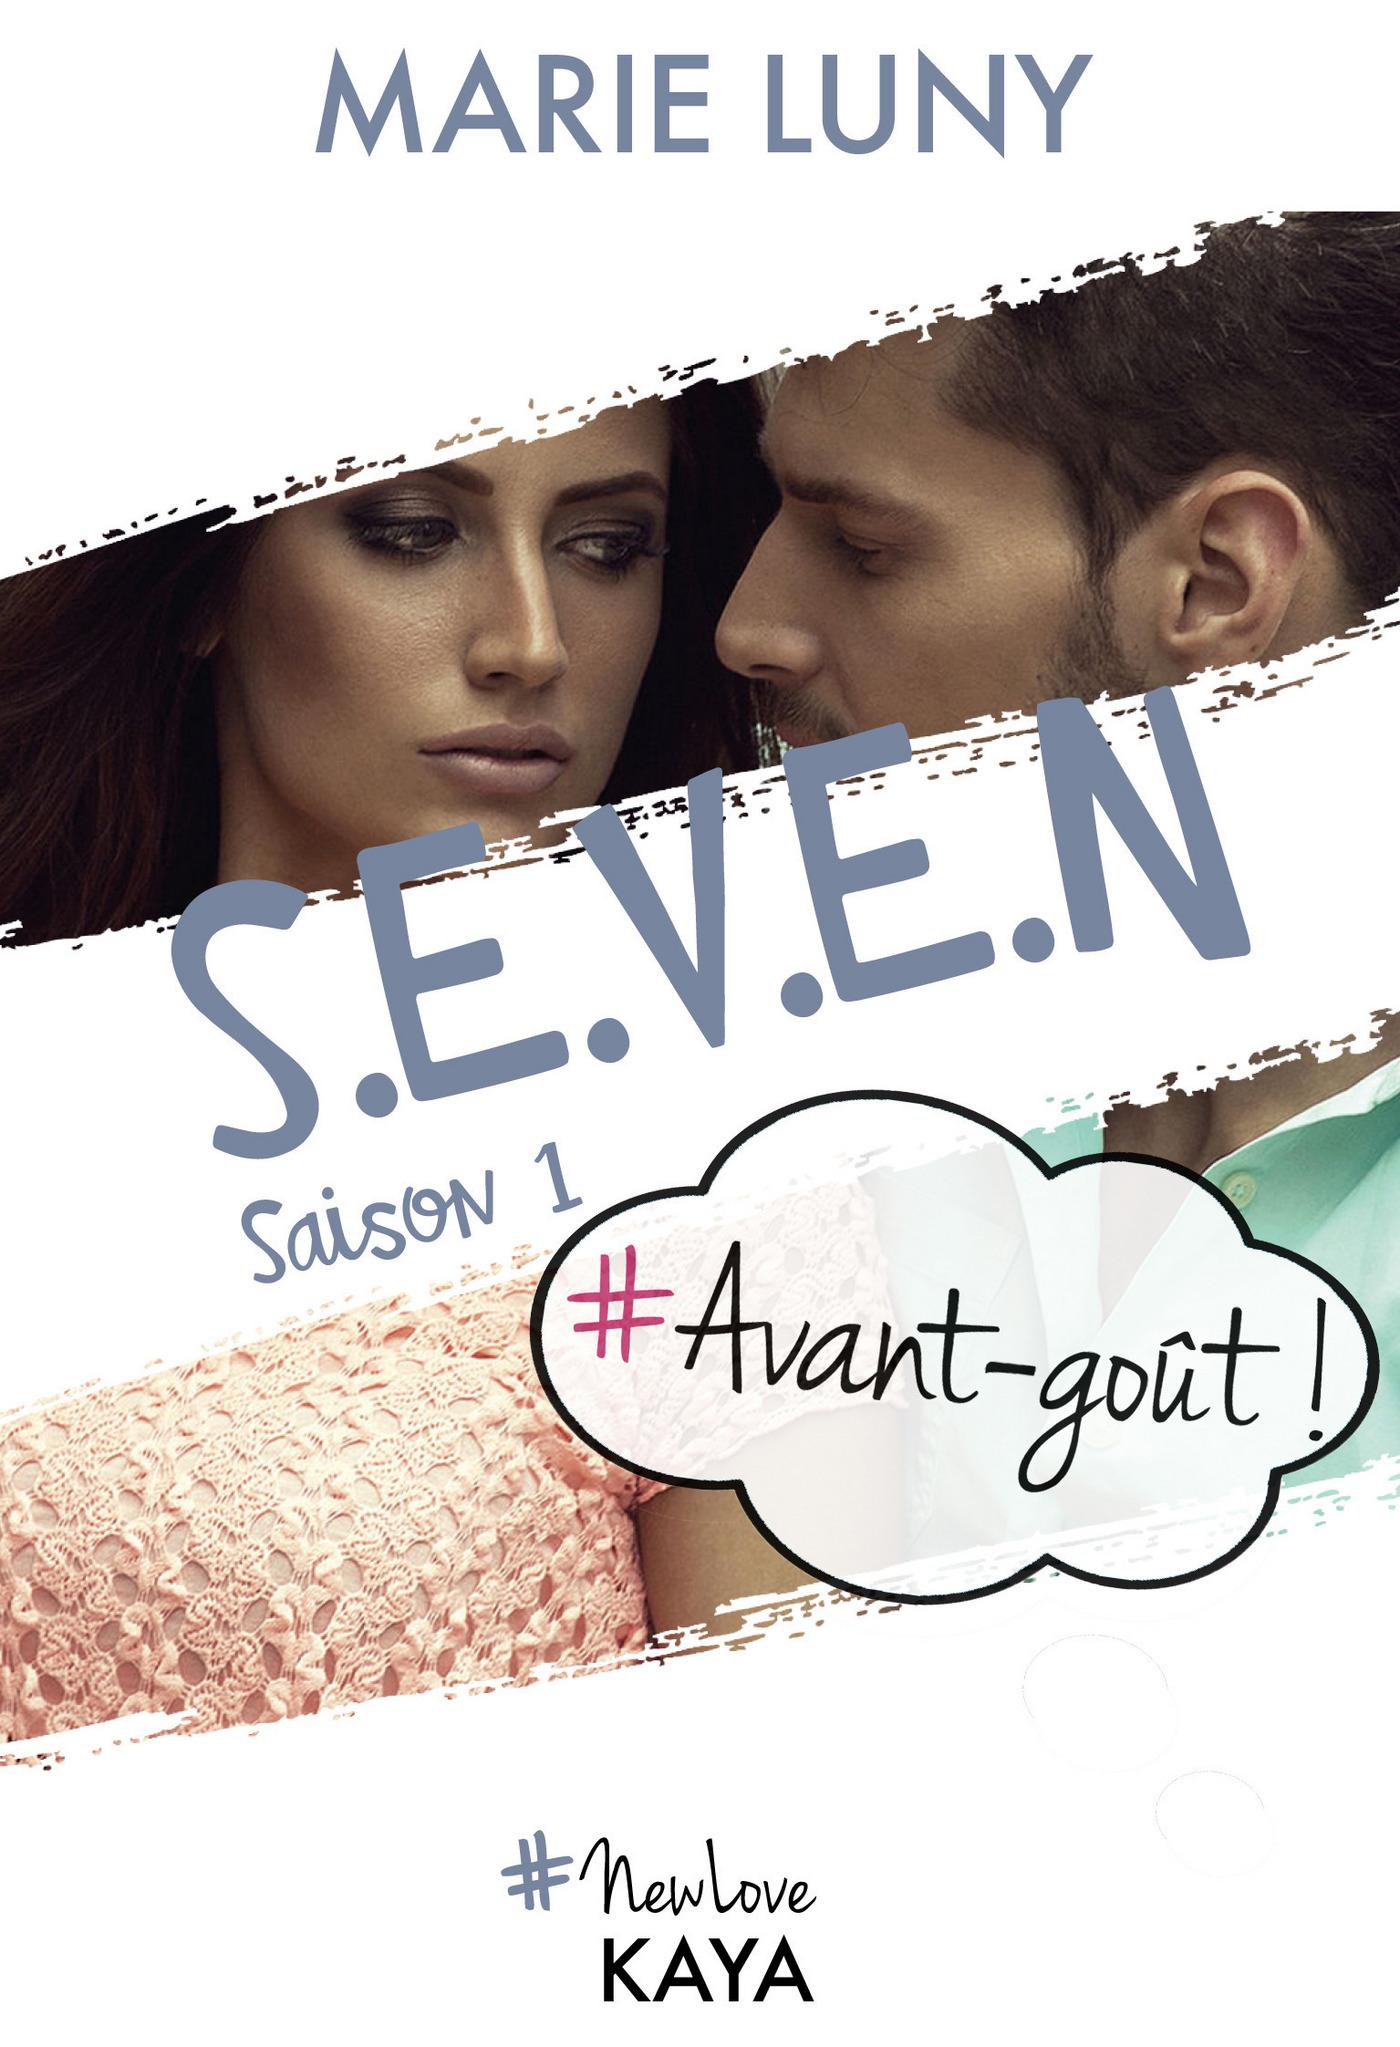 S.E.V.E.N - Saison 1 - Avant go?t!